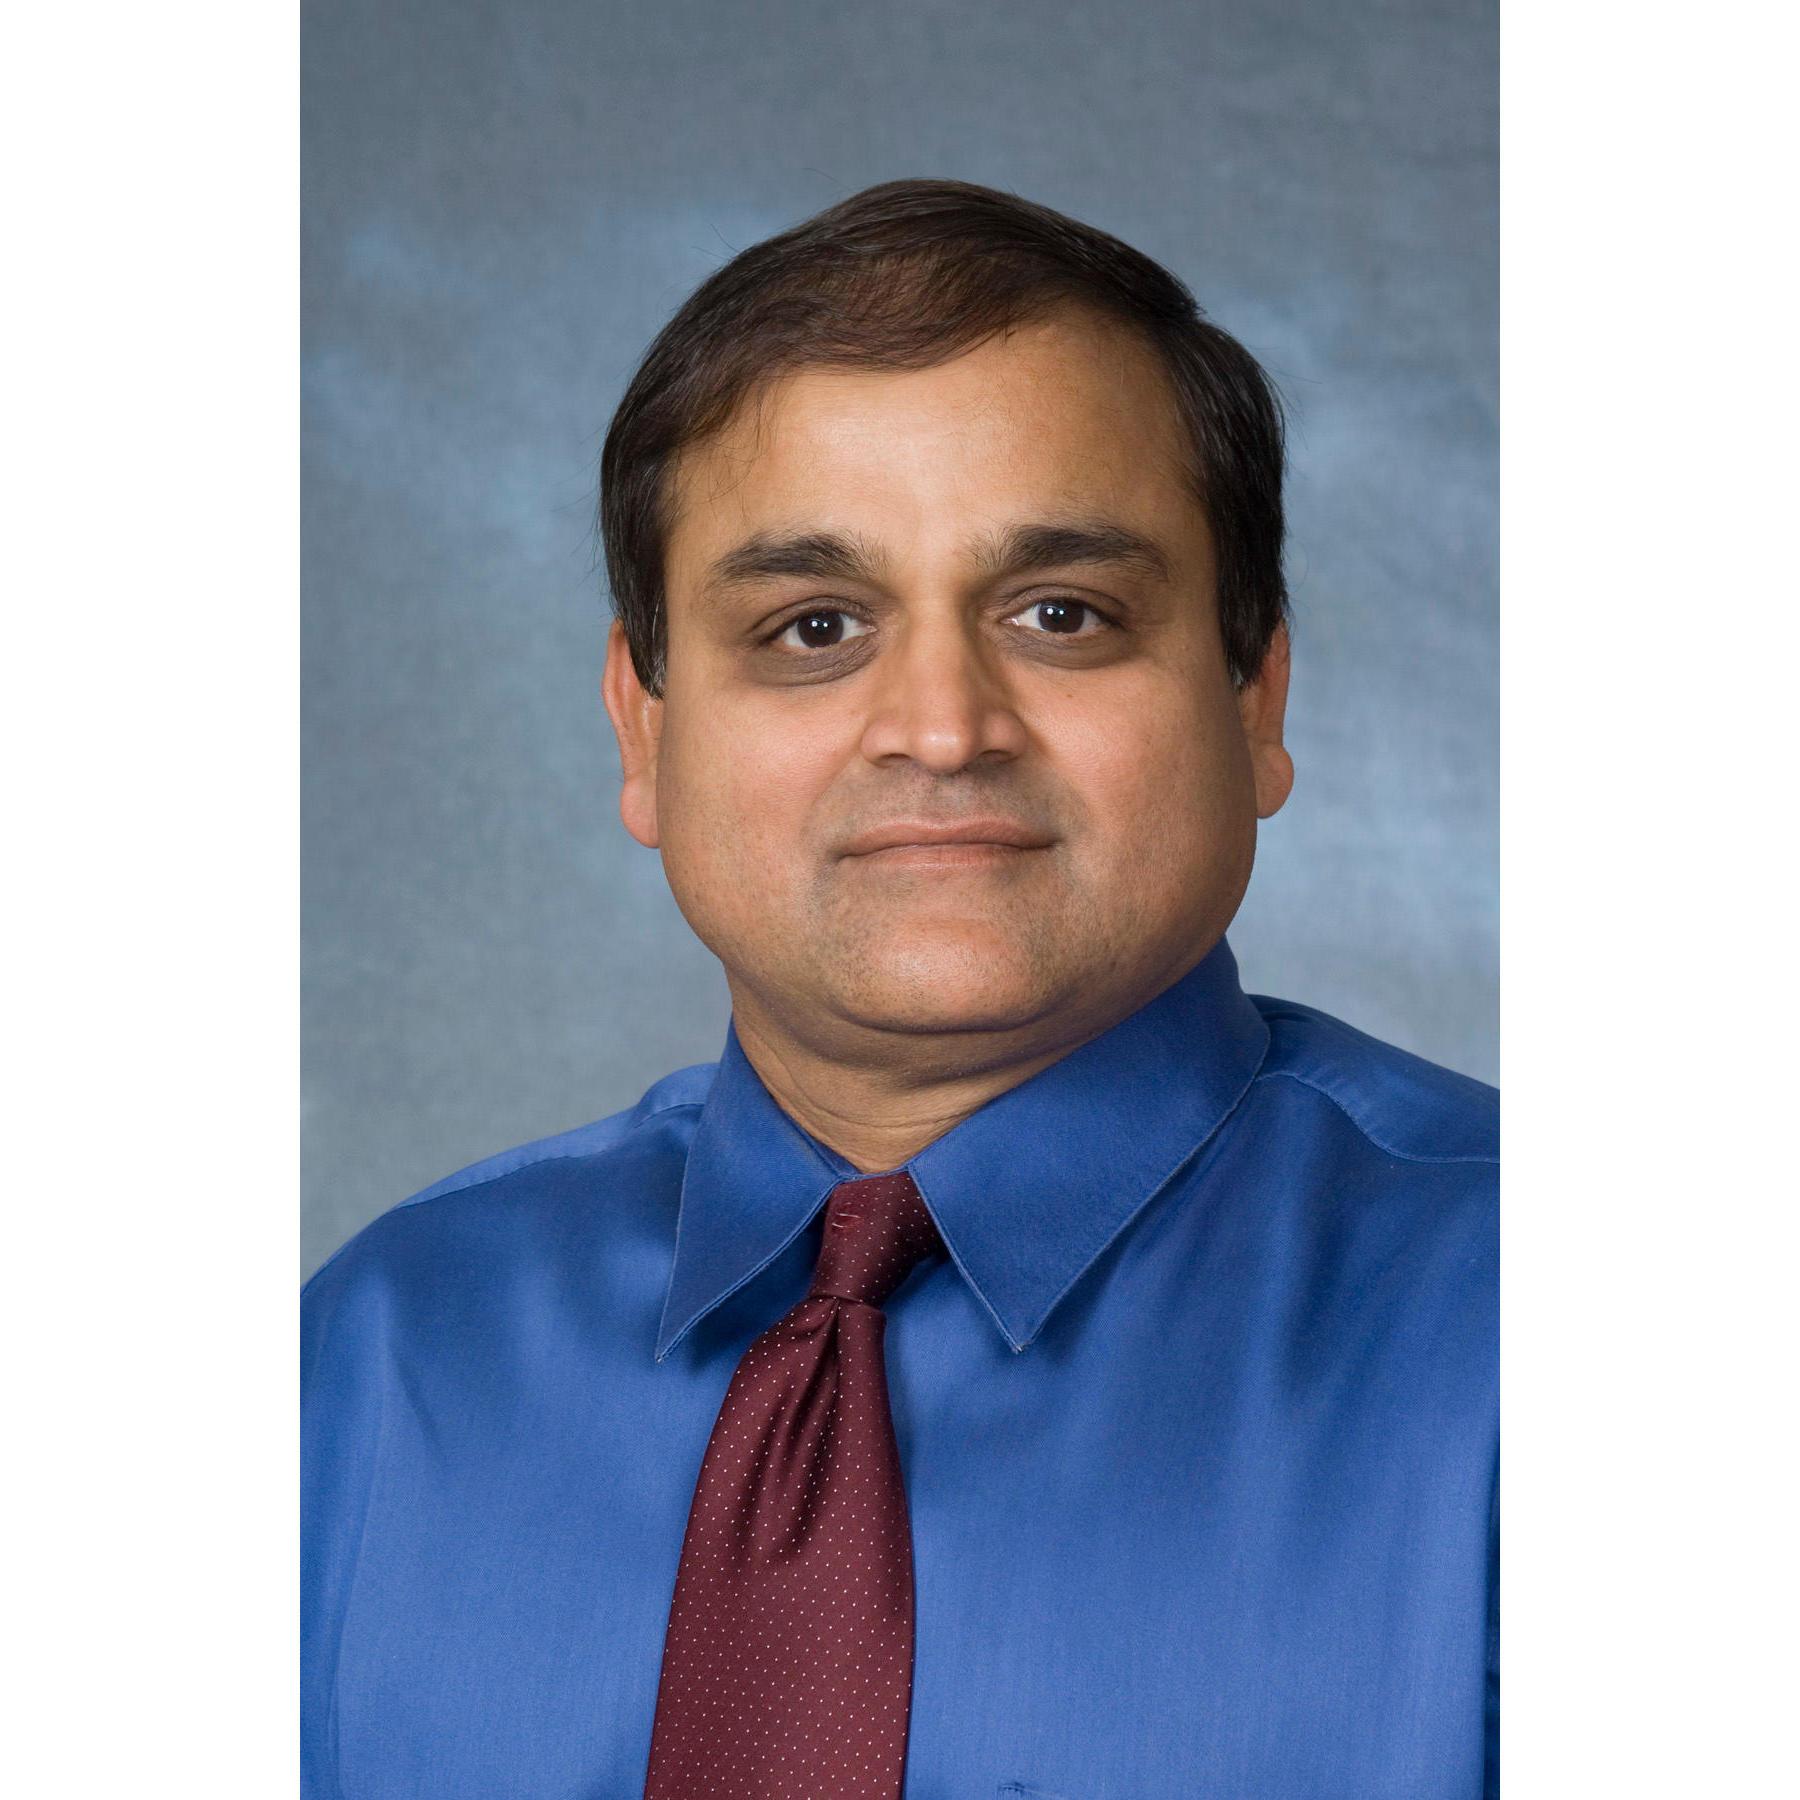 Dineshkumar Patel